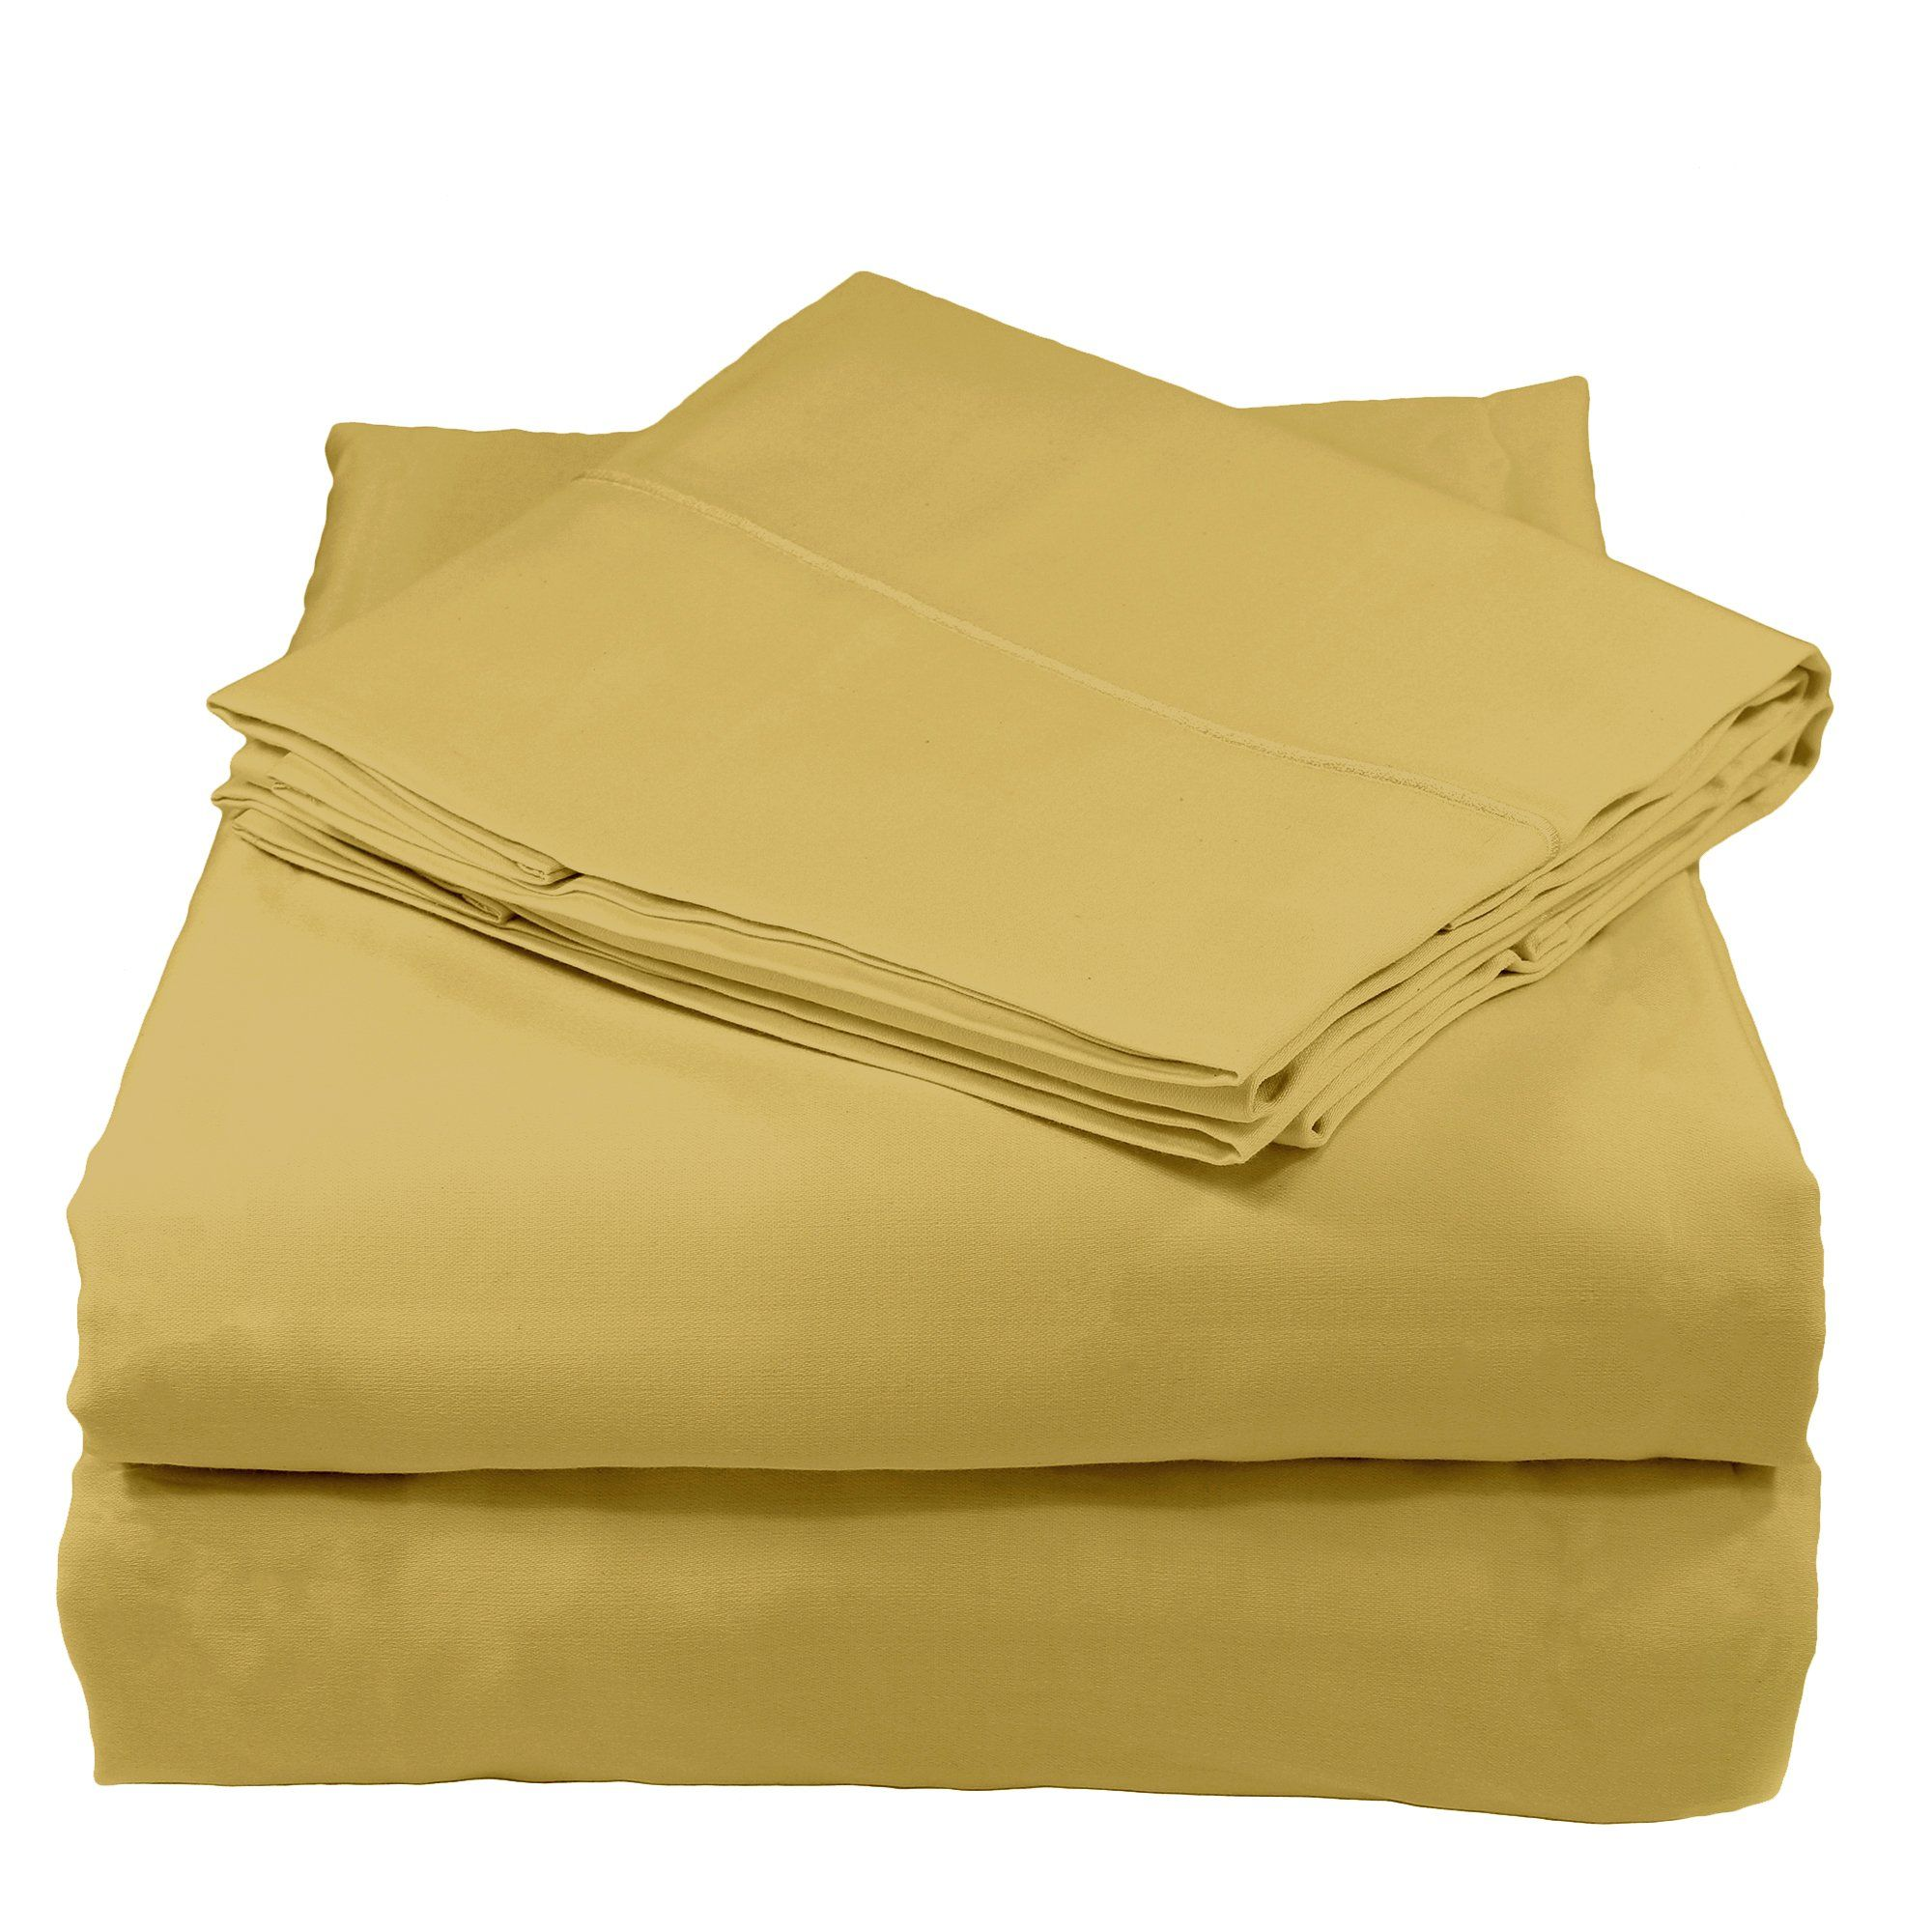 Whisper Organics Bed Sheets Organic Cotton Sheet Set 300